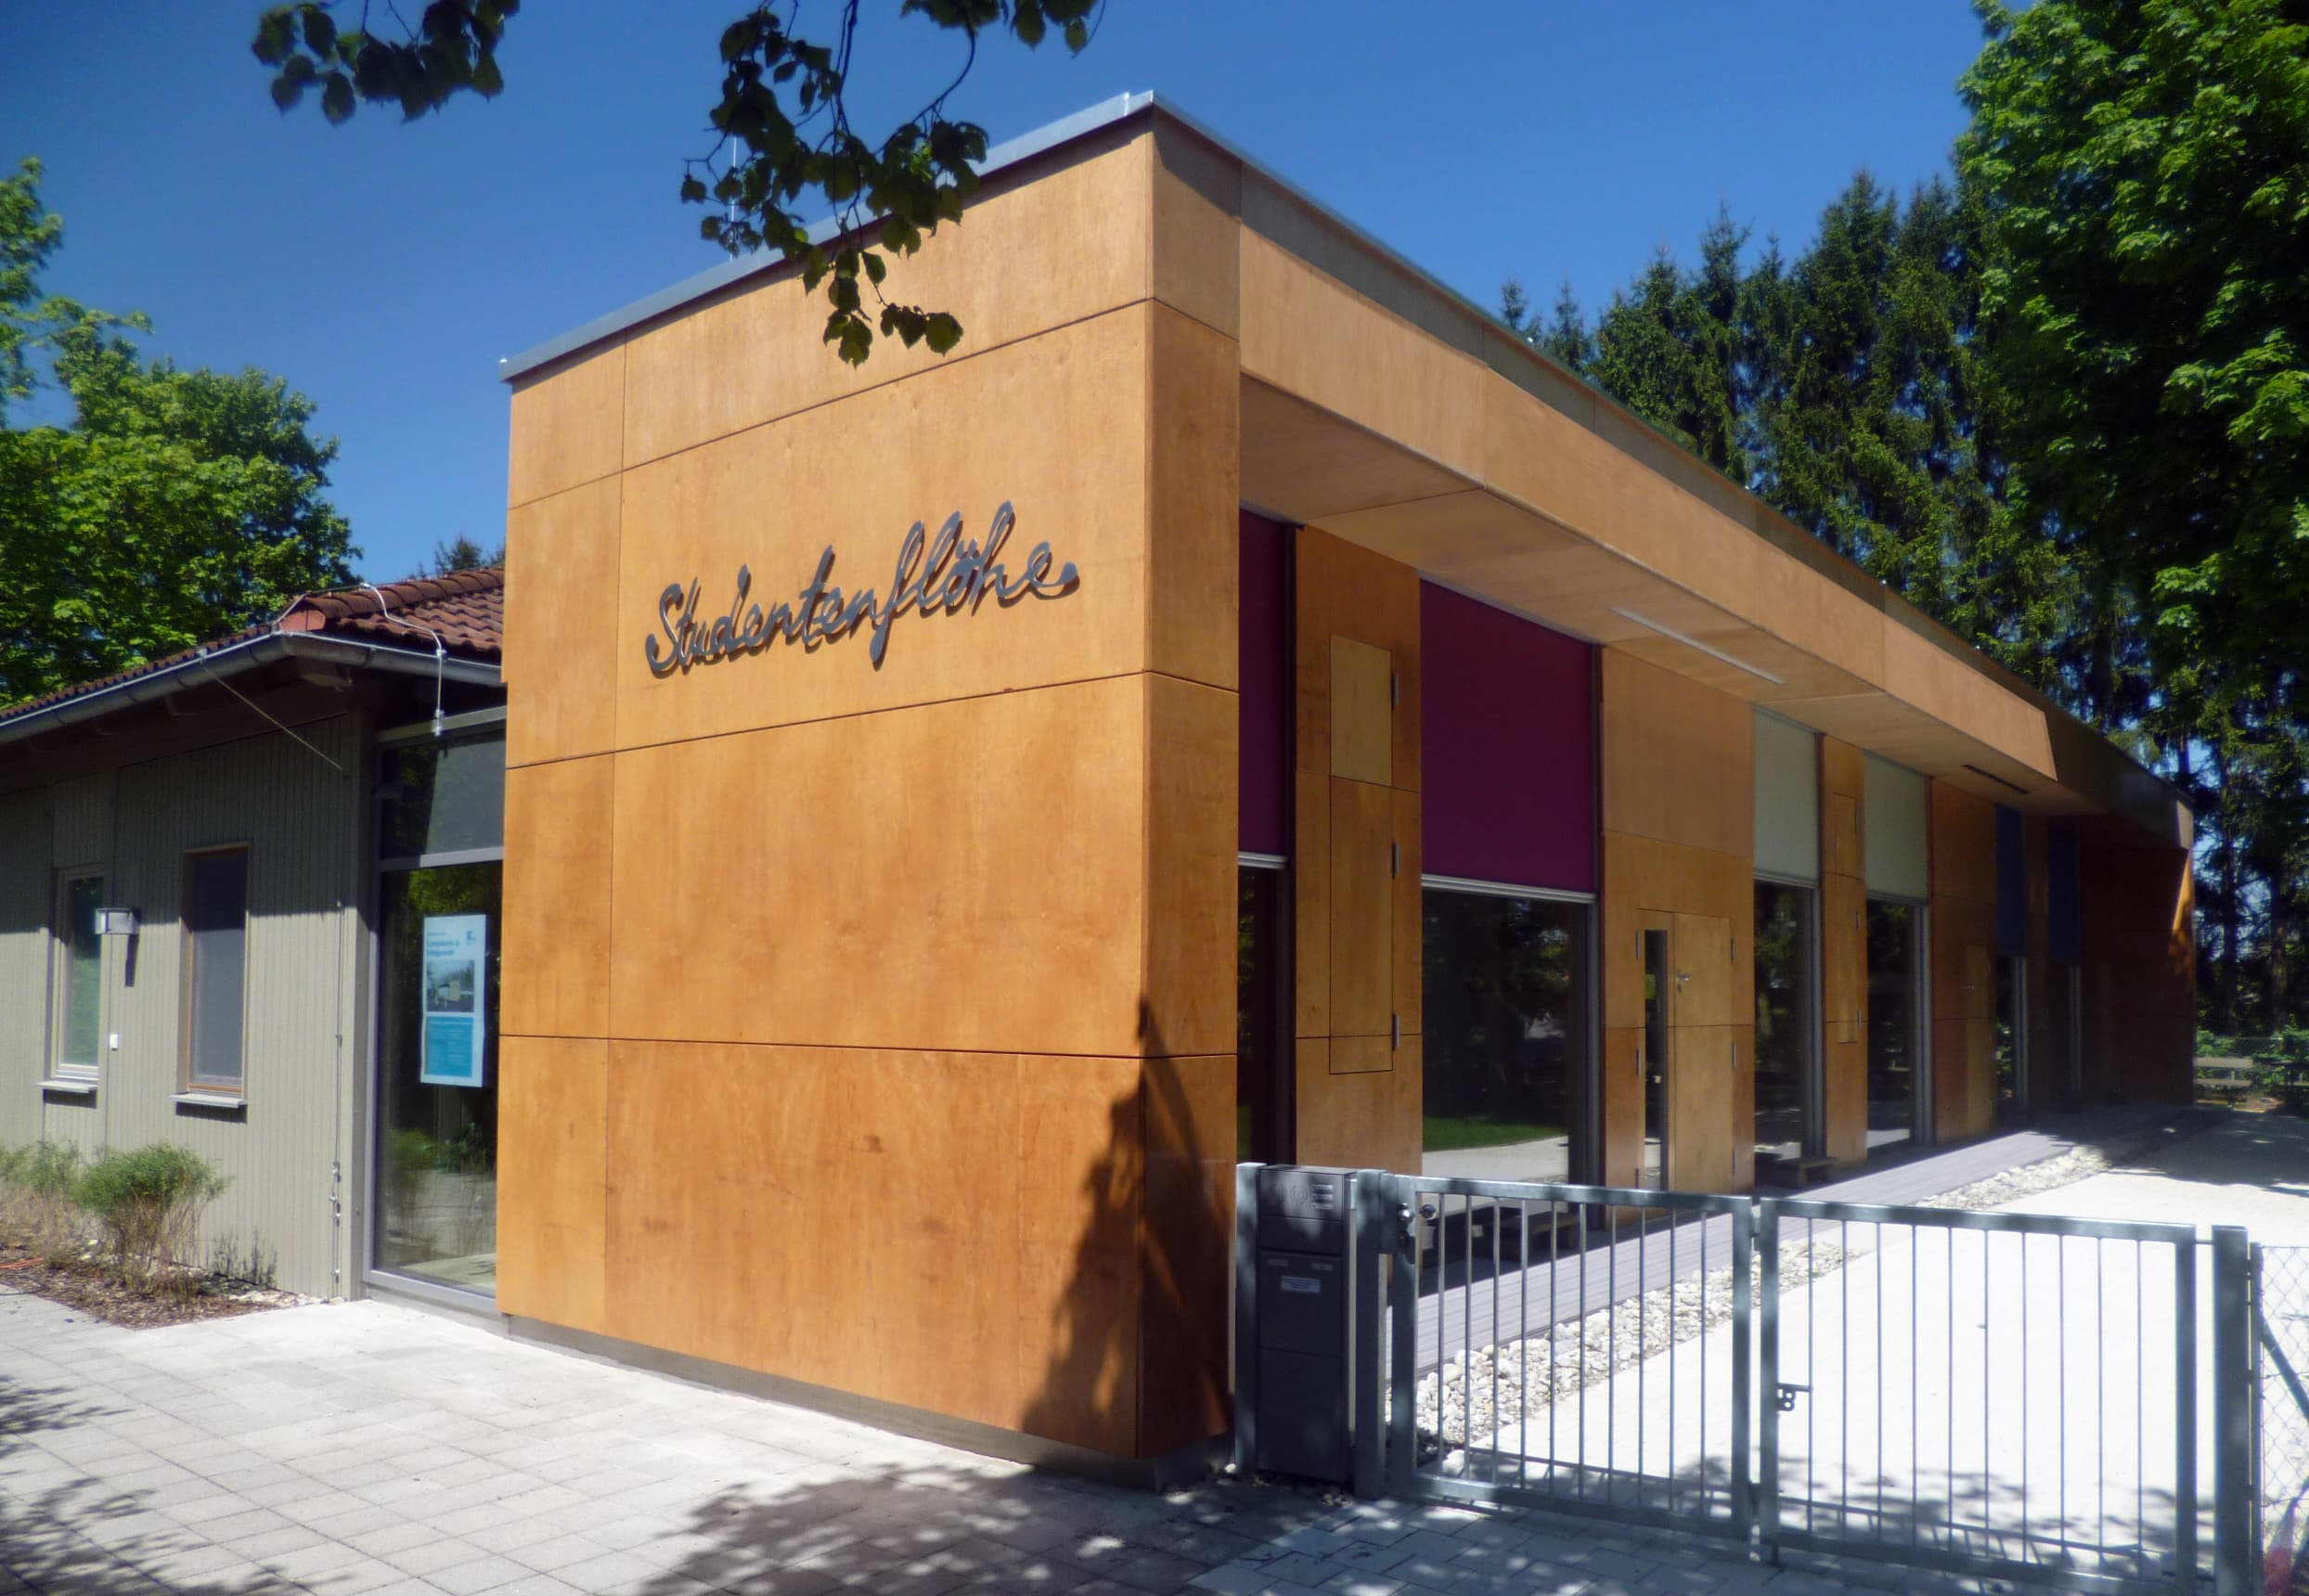 Kinderkrippe Studentenflöhe Rosenheim Aussen